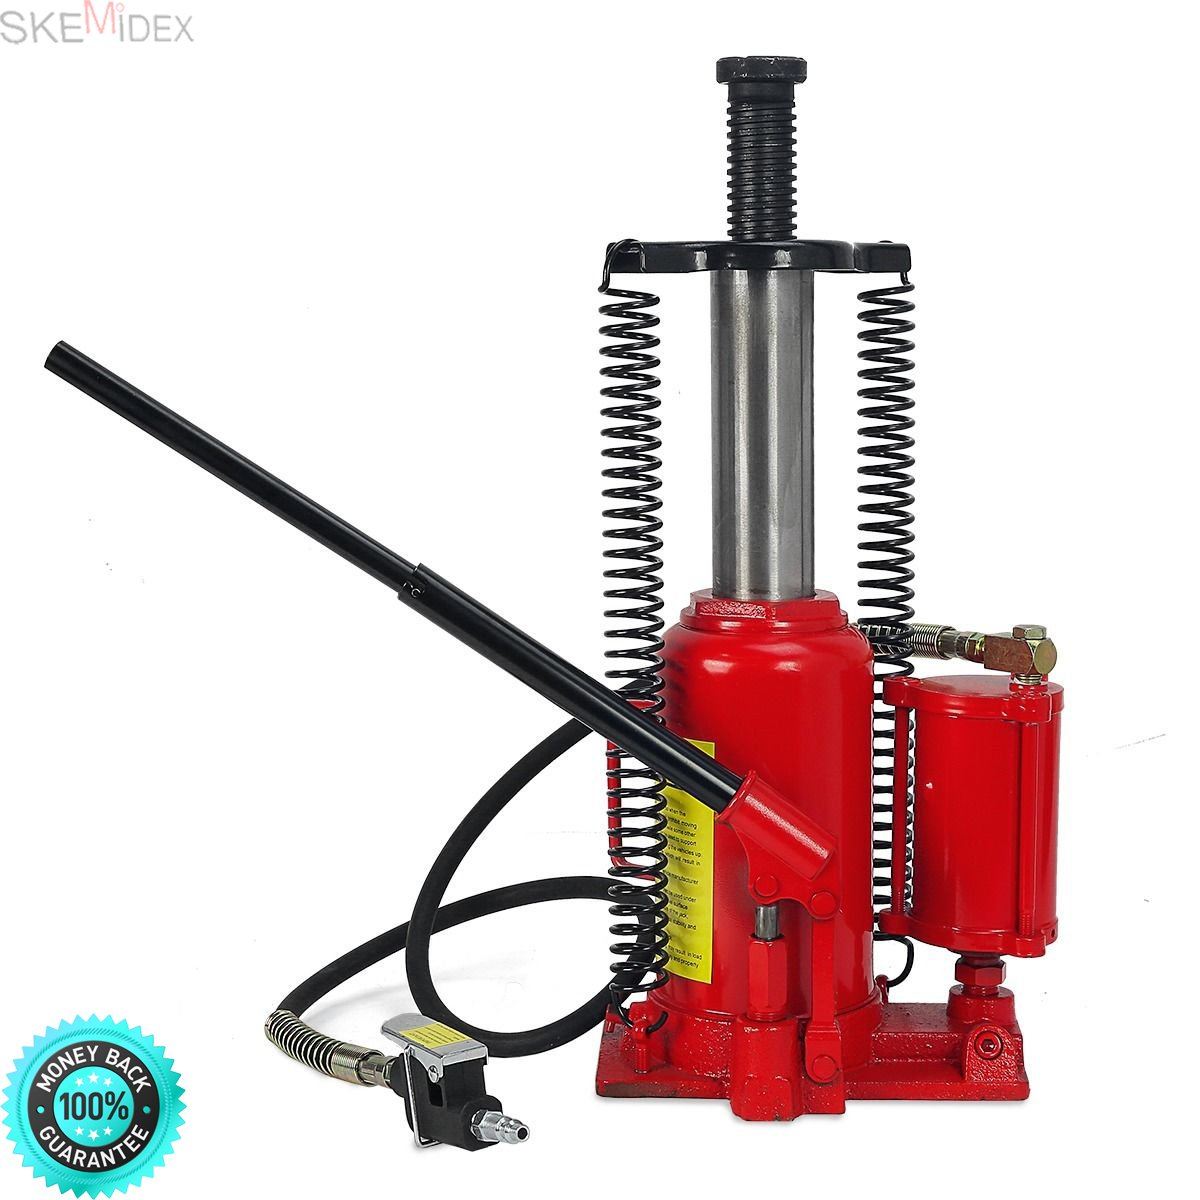 SKEMIDEX---Air Hydraulic Bottle Jack 20 Ton Manual 40,000lb HEAVY DUTY Auto Truck RV Repair And hydraulic pump how it works parker hydraulic pumps hydraulic pump for log splitter hydraulic gear pumps